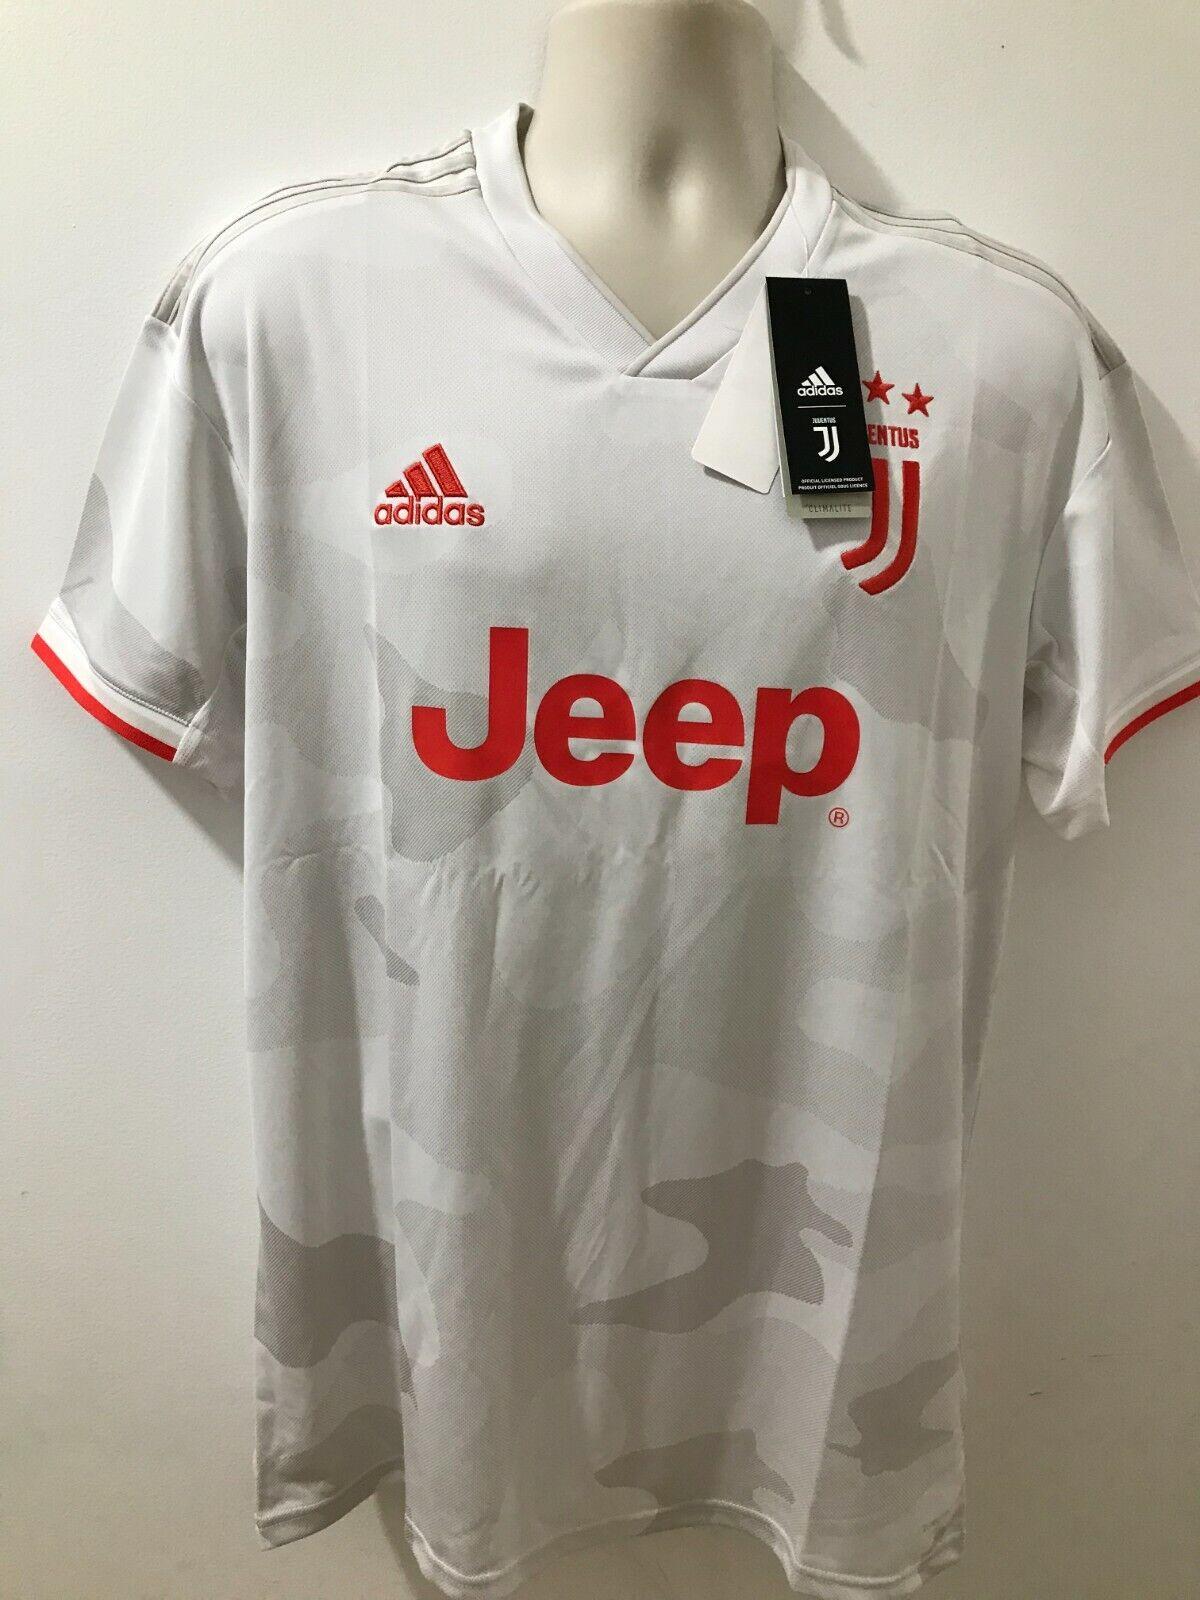 adidas Juventus Away Soccer Men's Jersey 2019/20 - Size L for sale ...